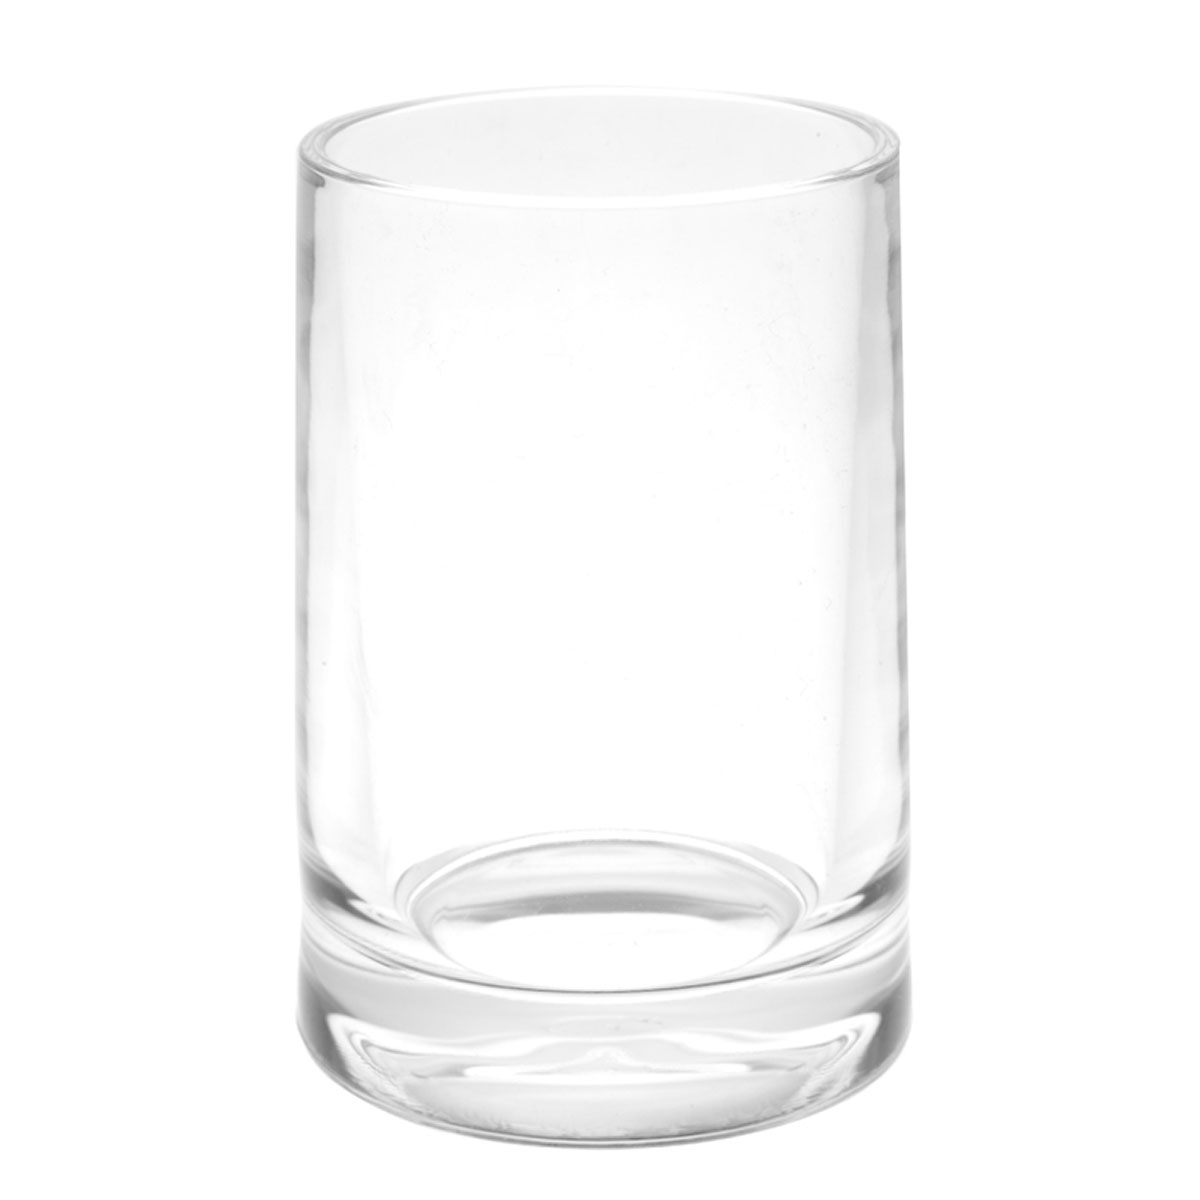 Gobelet transparent (Transparent)